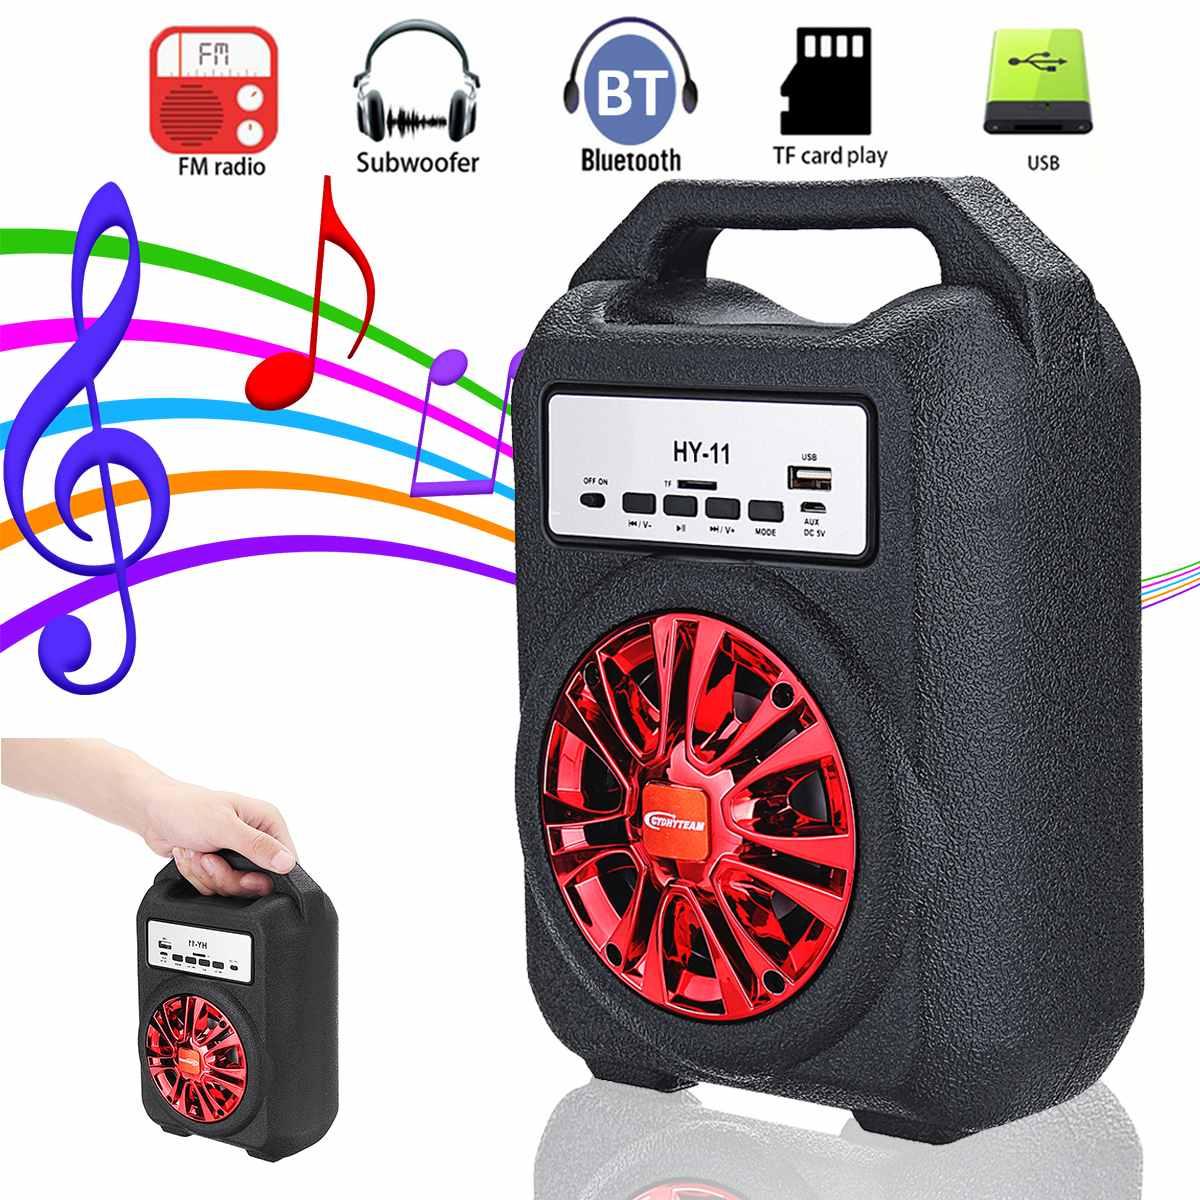 Hy-11 Drahtlose Bluetooth Lautsprecher Led Hifi Handliche Lautsprecher Stereo Bass Tragbare Subwoofer Fm Aux Tf Außen Lautsprecher Player Top Wassermelonen Lautsprecher Unterhaltungselektronik